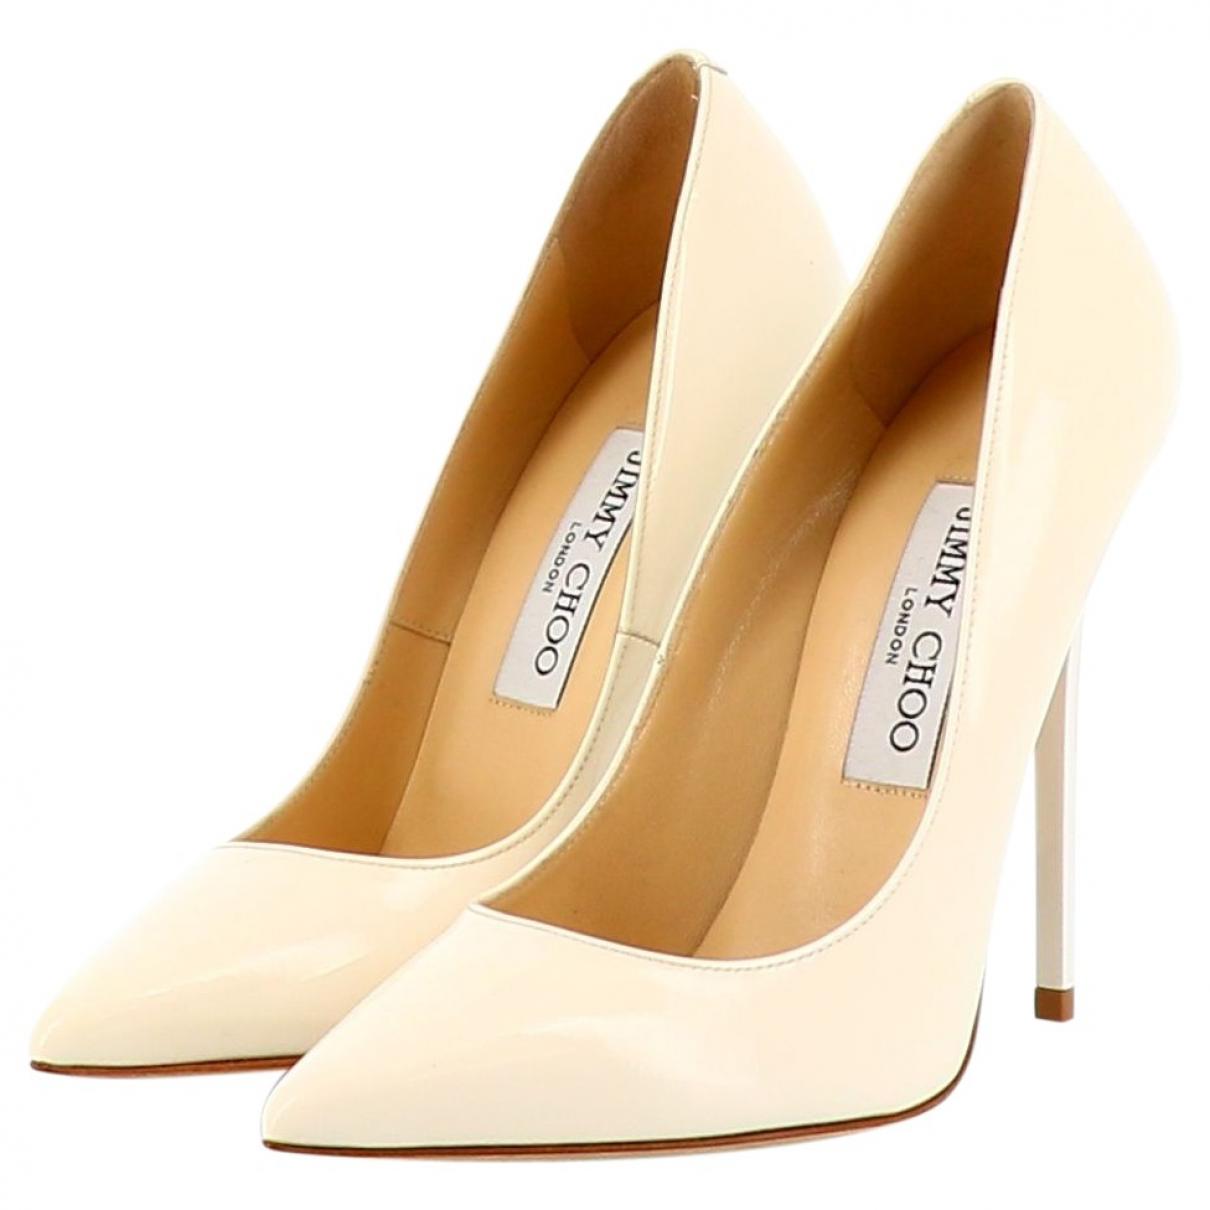 Jimmy Choo \N White Patent leather Heels for Women 36 EU